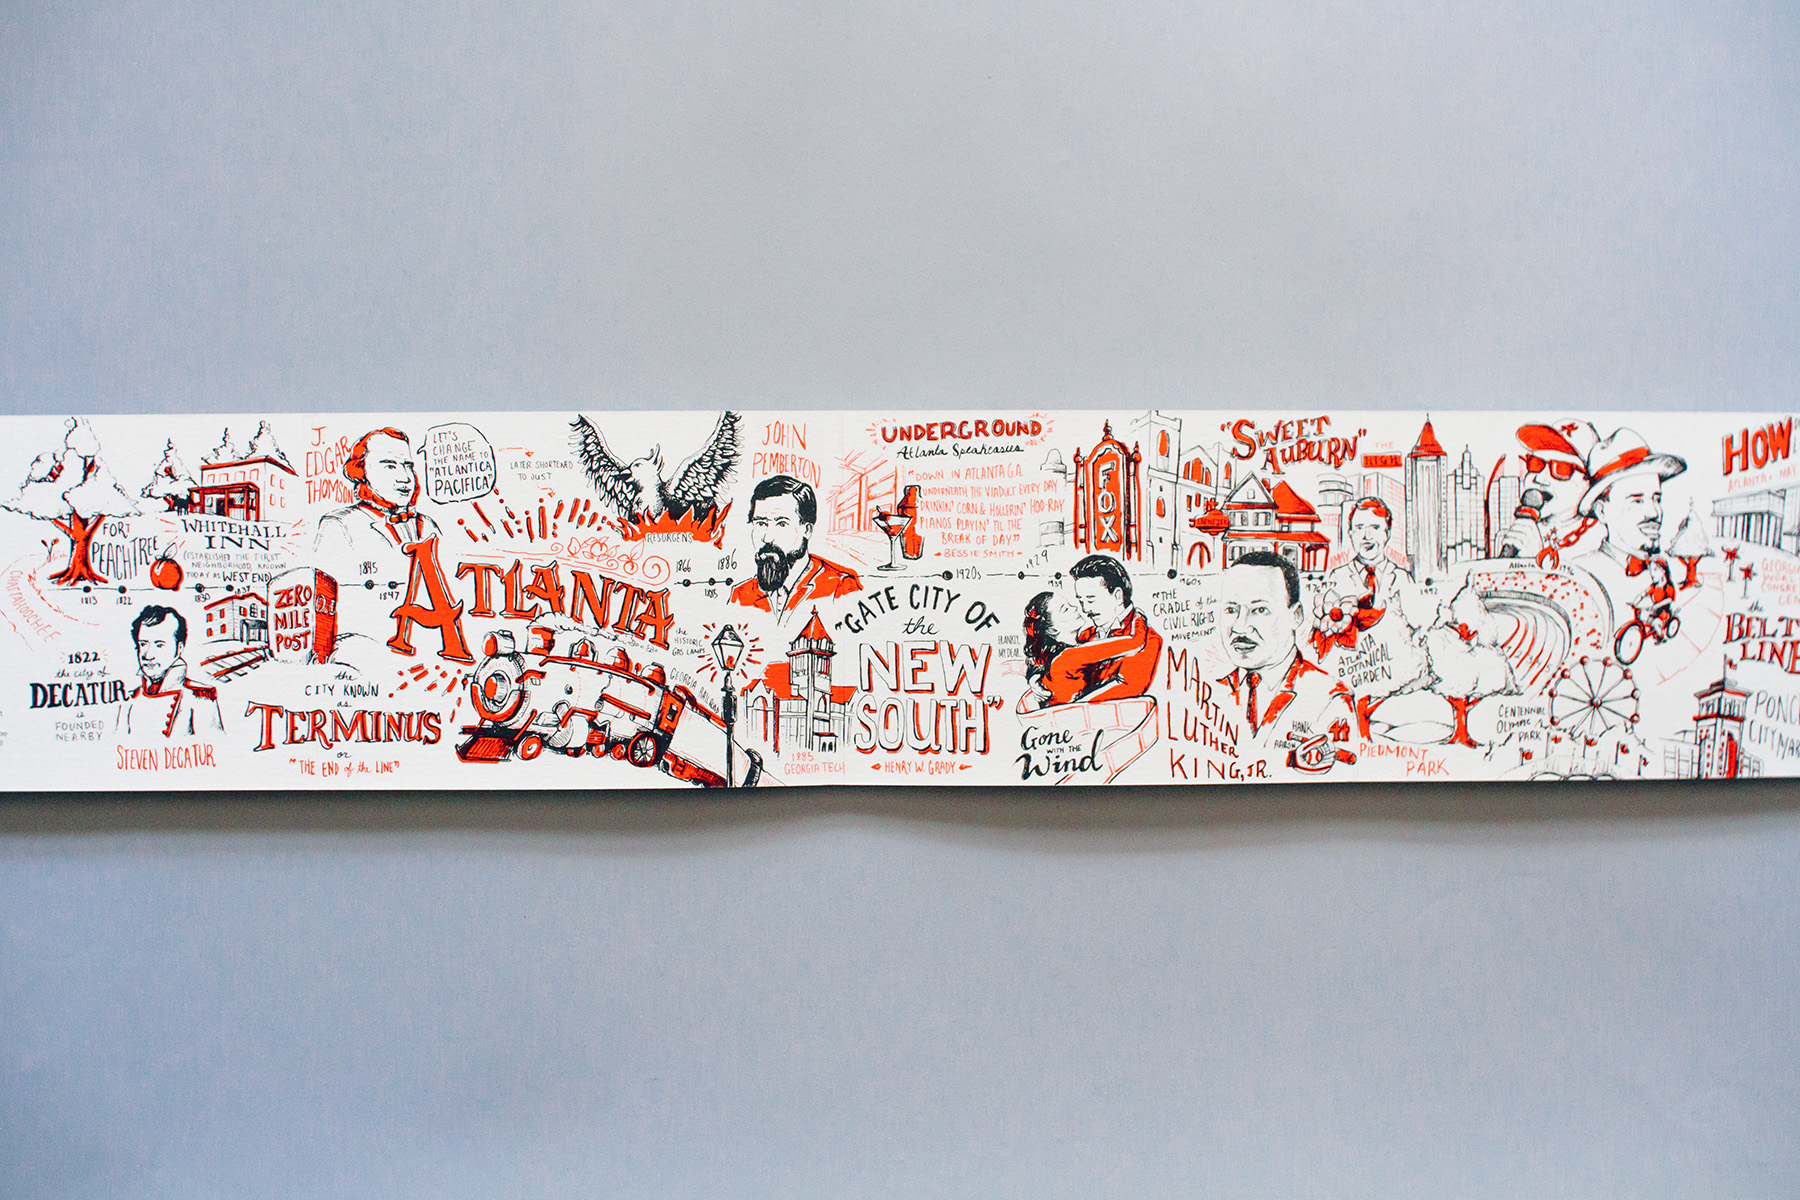 Atlanta illustrated historical timeline